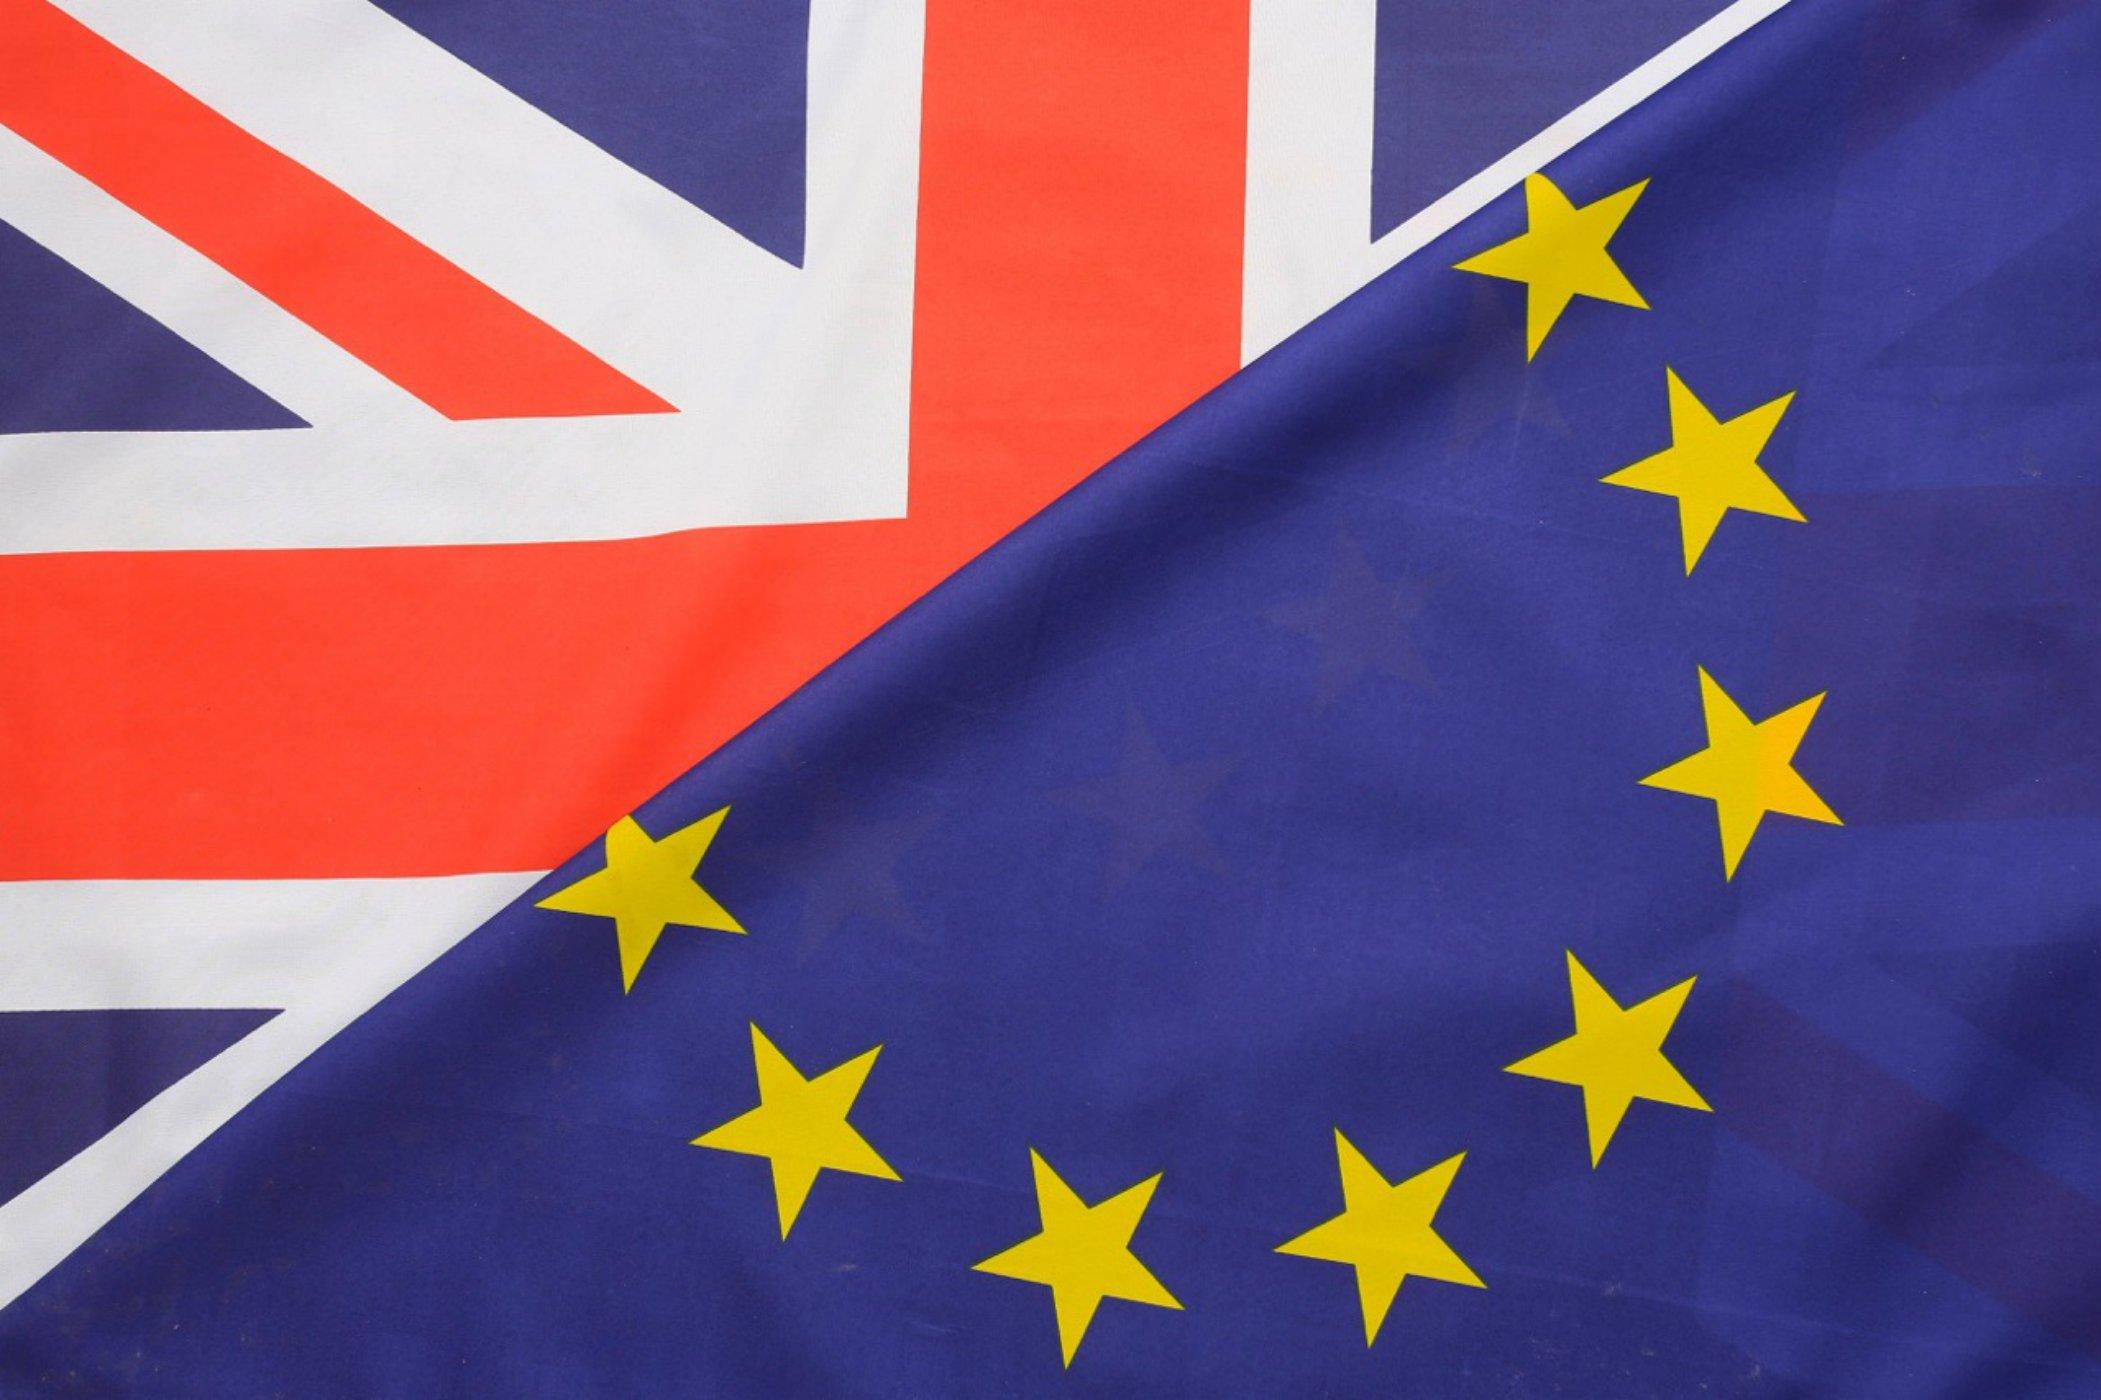 Regne Unit UE banderes